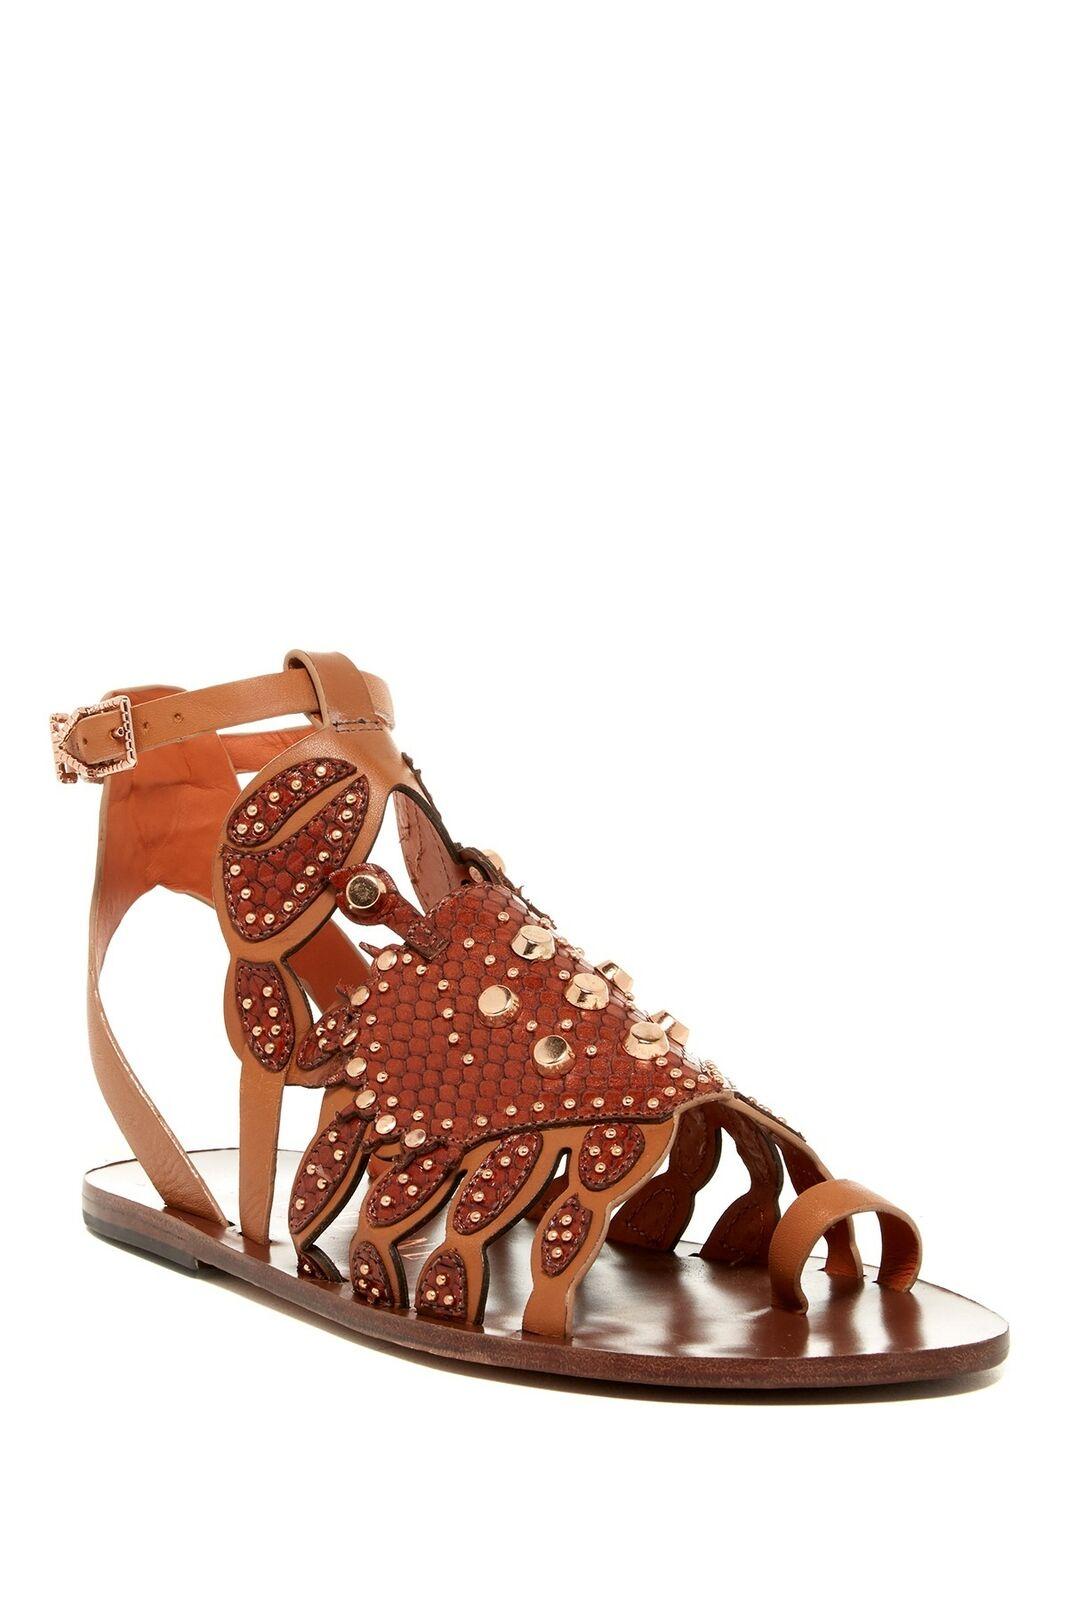 Ivy Kirzhner Scrabby Cognac Leather Rich oro Studded Gladiator Flat Sandals